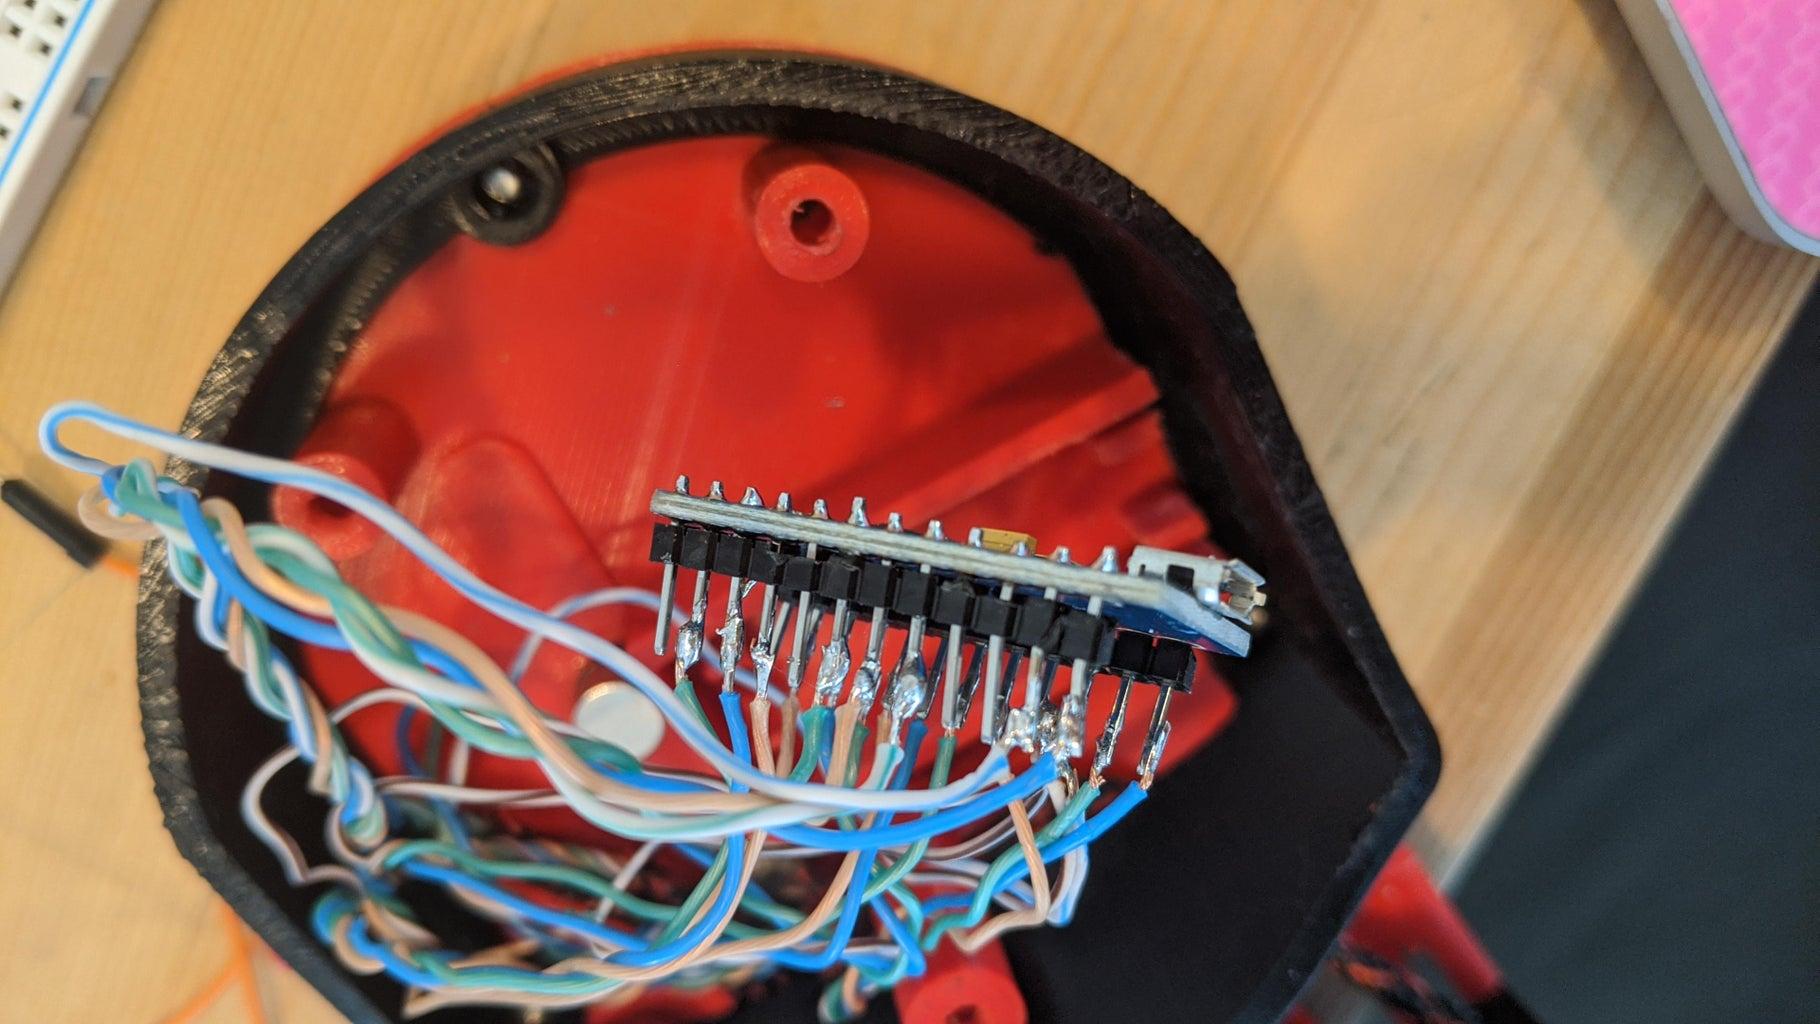 Put Your Controller Inside the Joystick